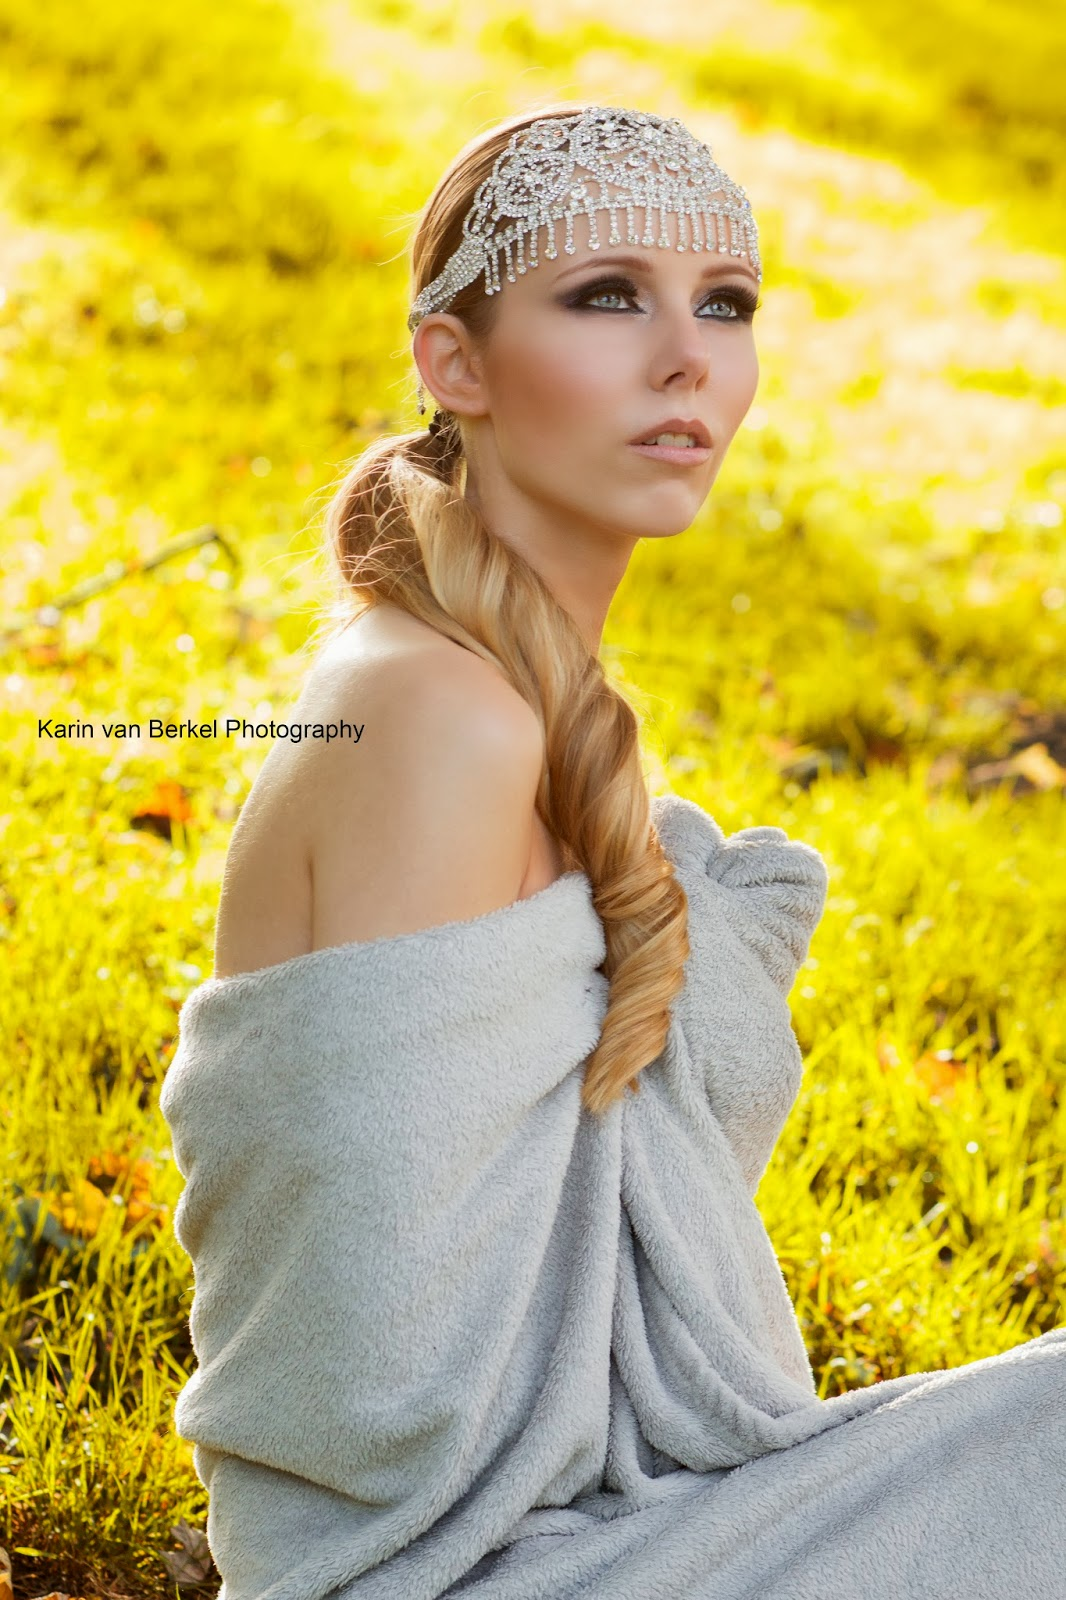 Karin van Berkel photography